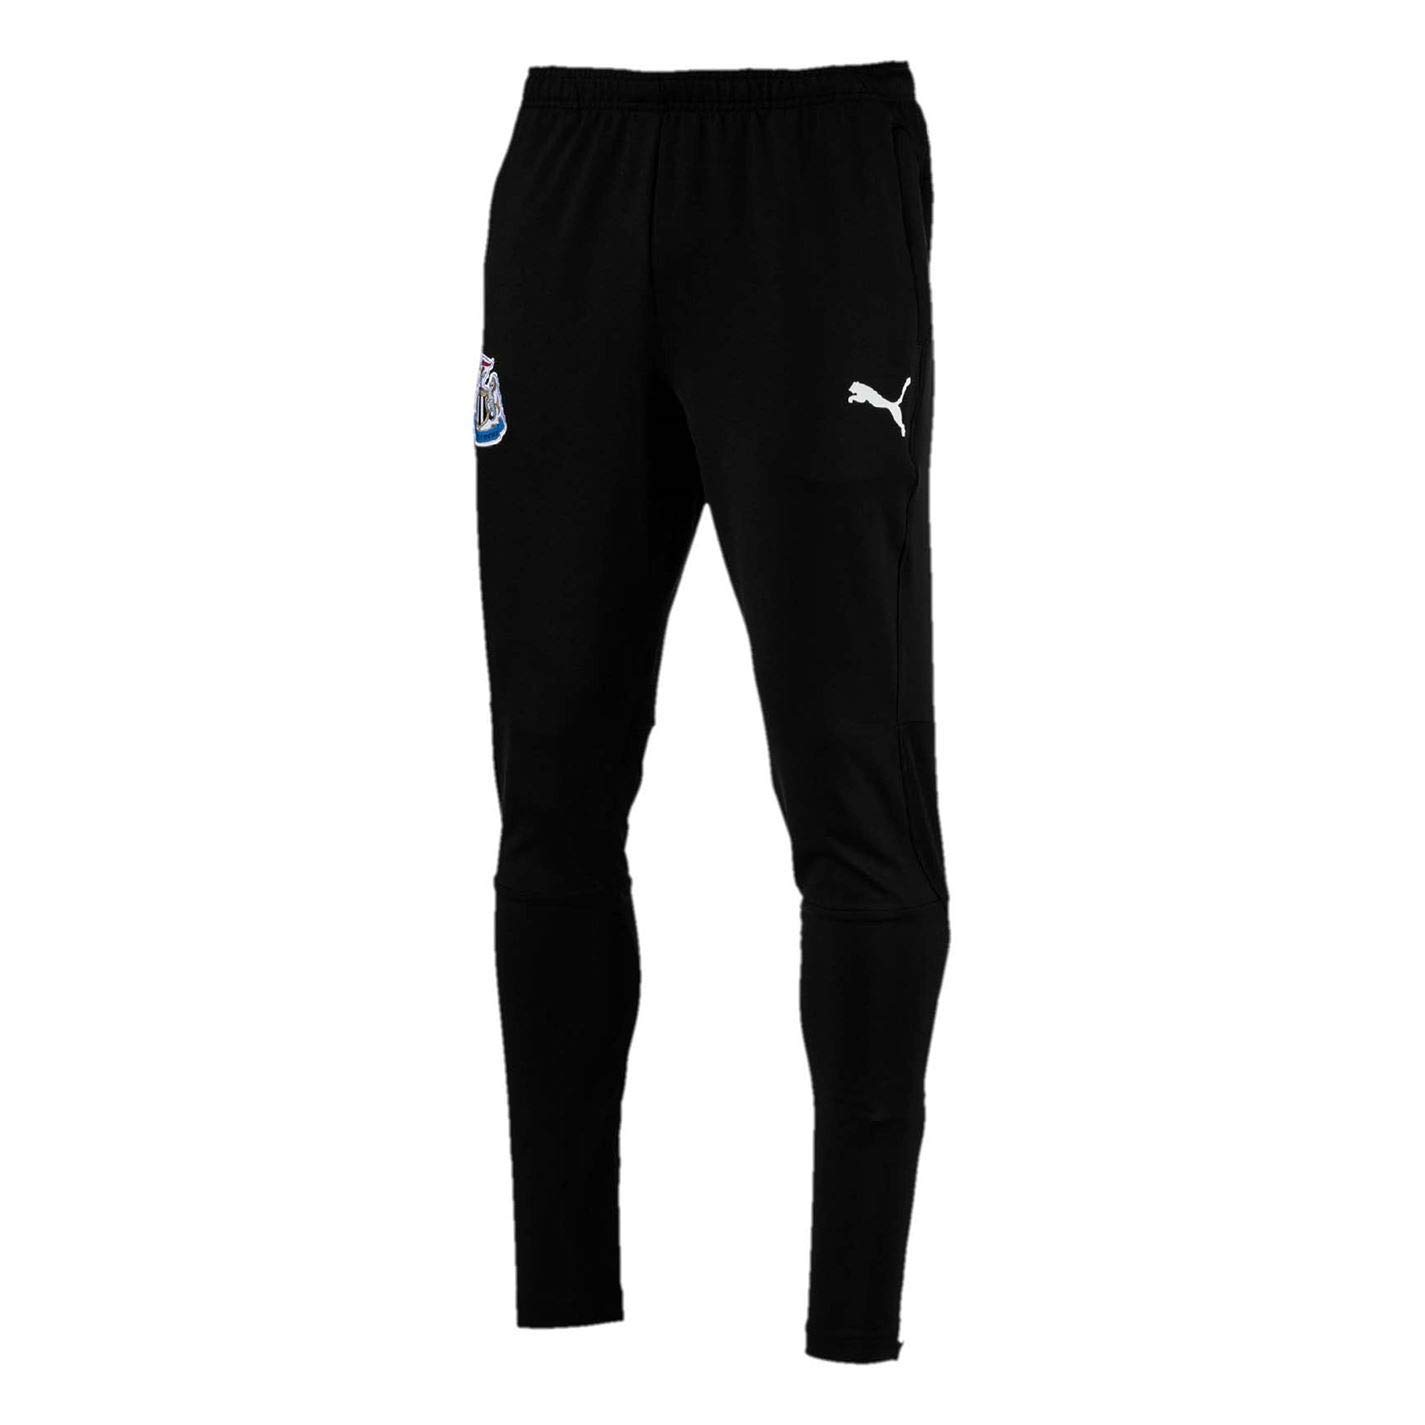 Official Brand Puma Newcastle United Trainingshose 2018, 19 Herren, Schwarz